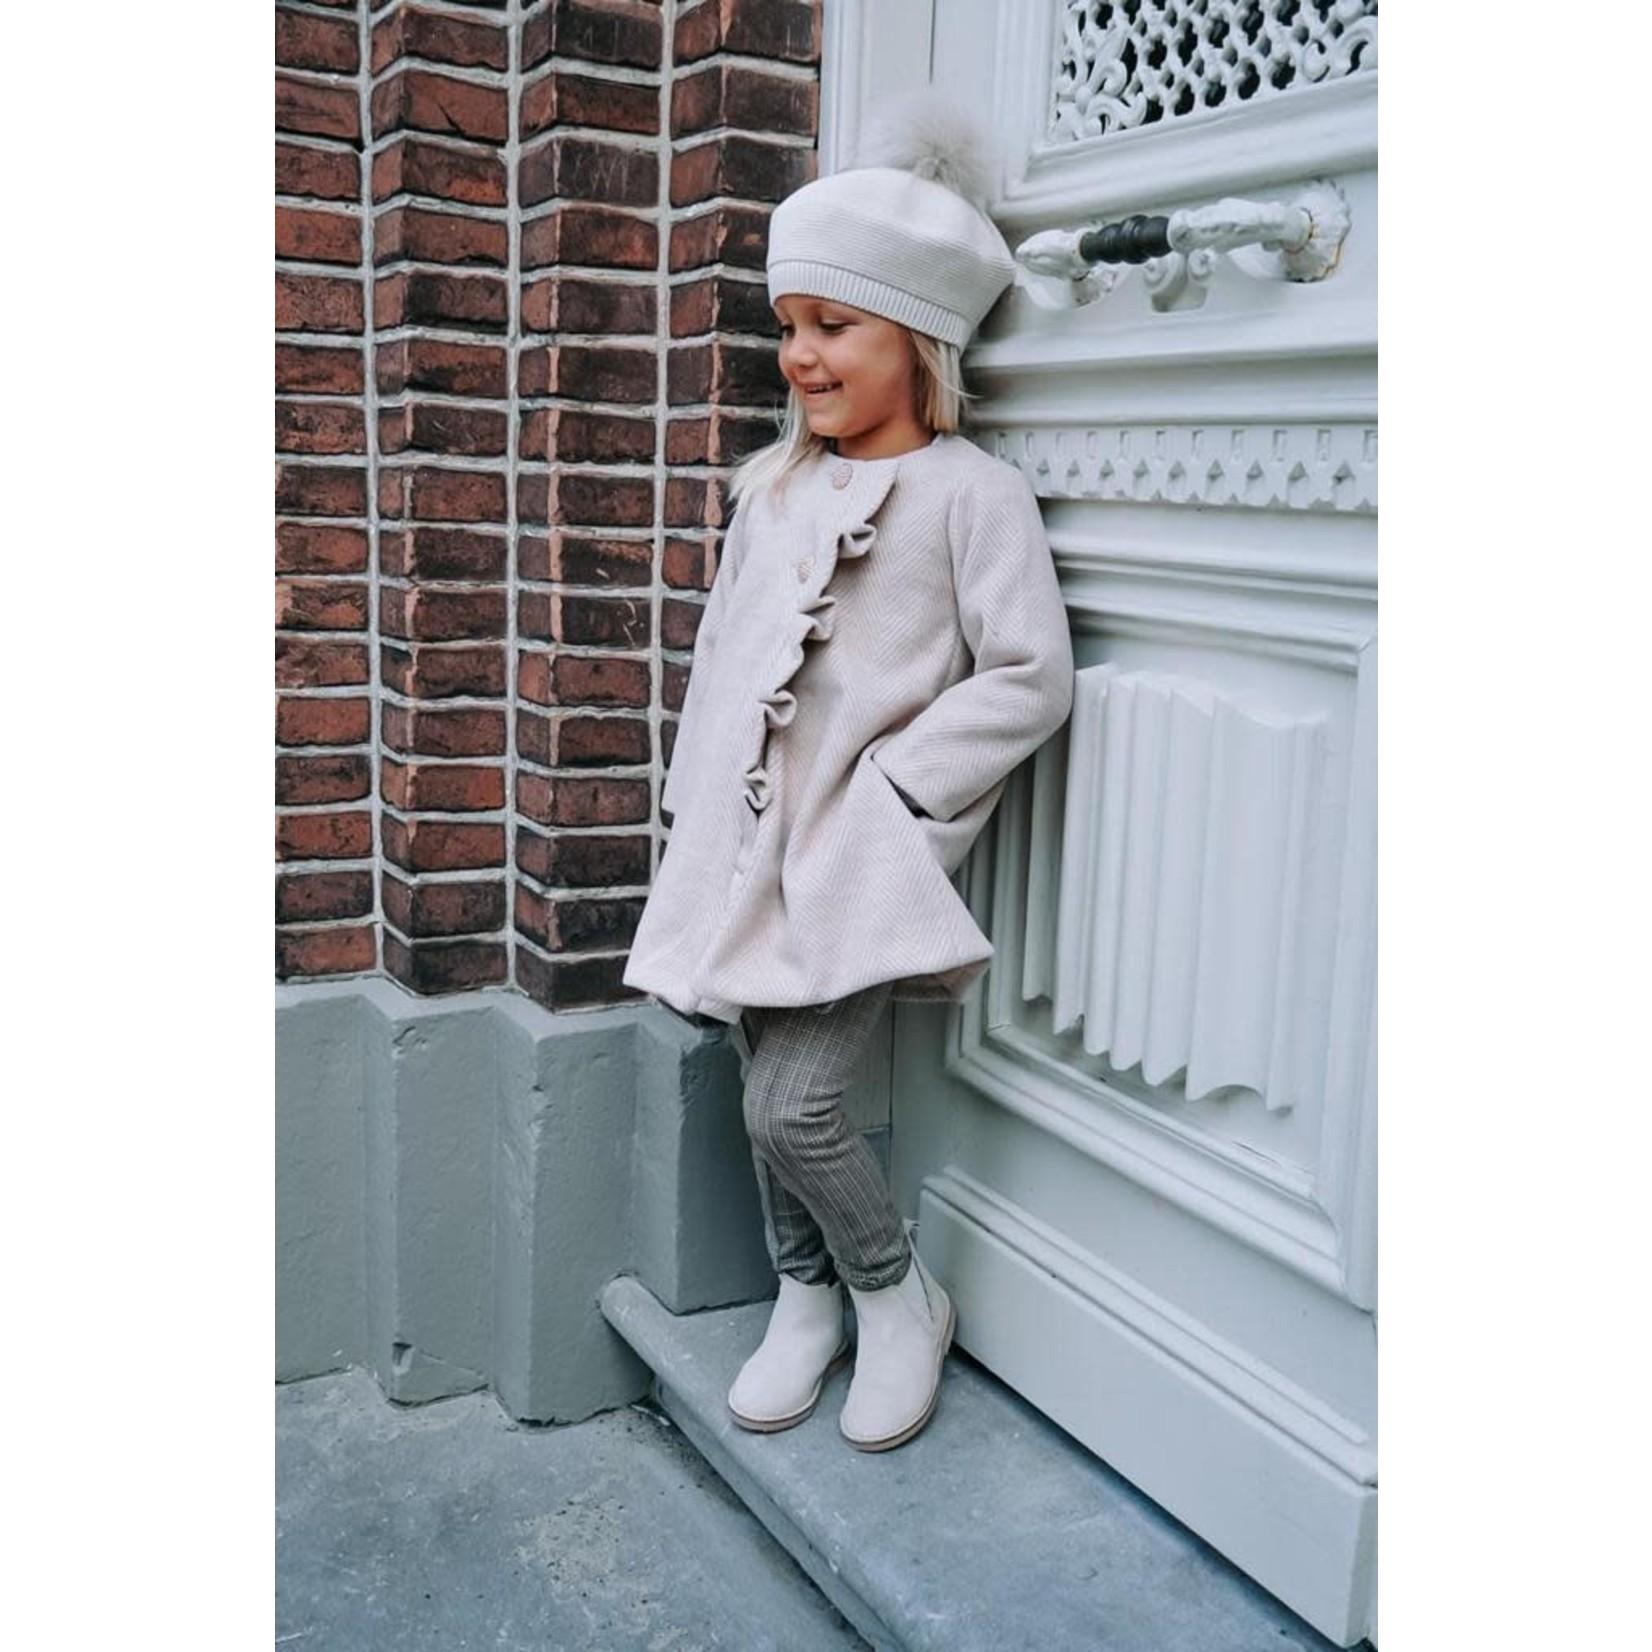 Petite Zara Jacket Nikki - Petite Zara